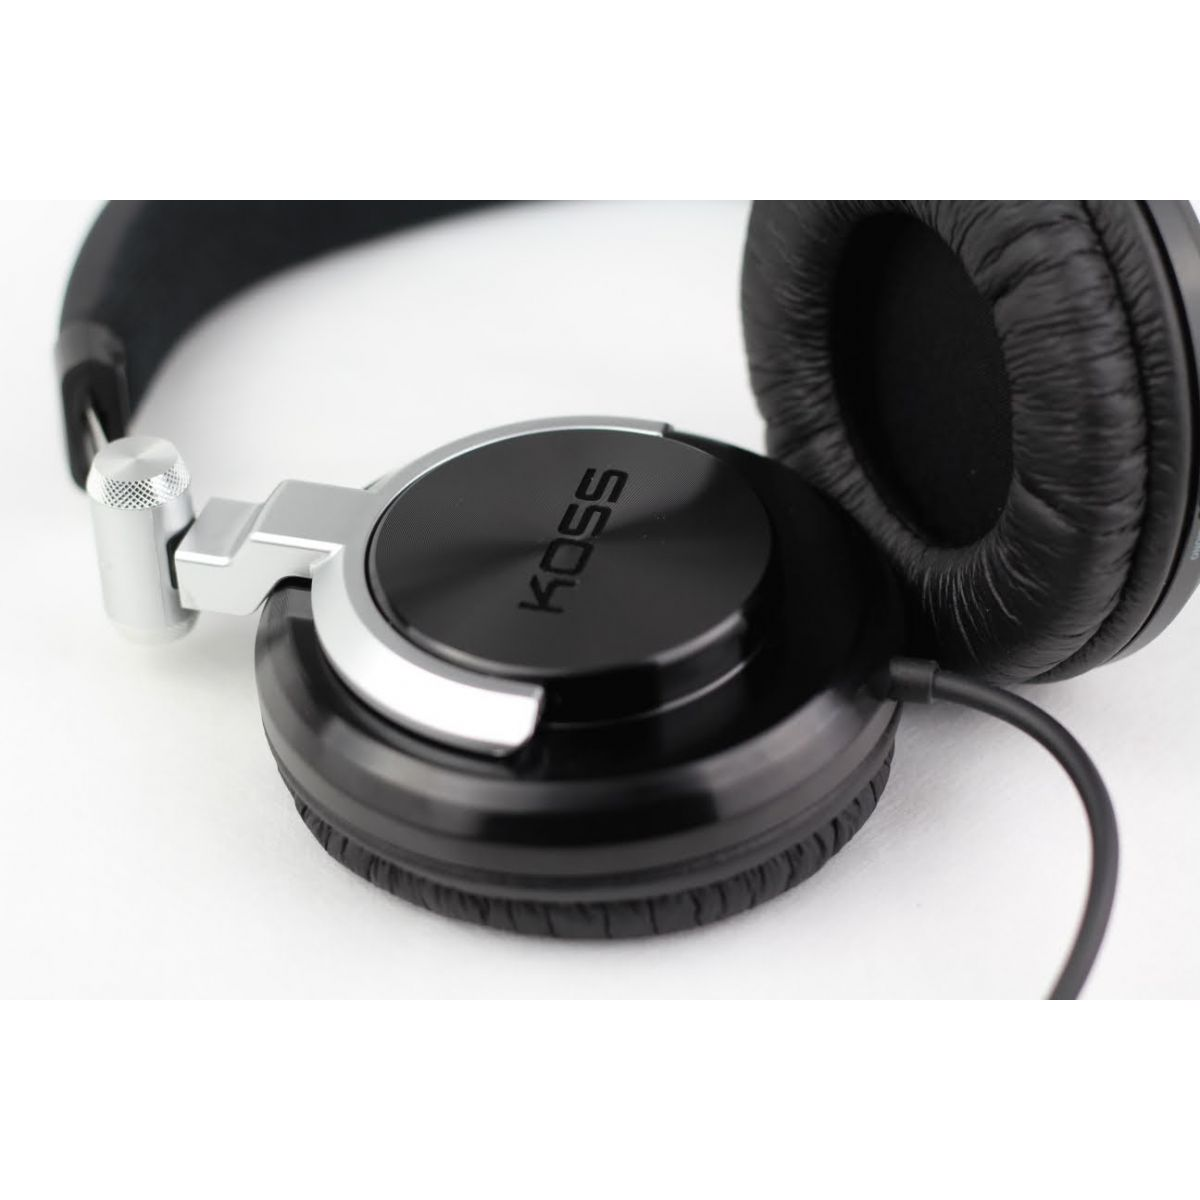 Koss Dj 100, Fone de ouvido Profissional